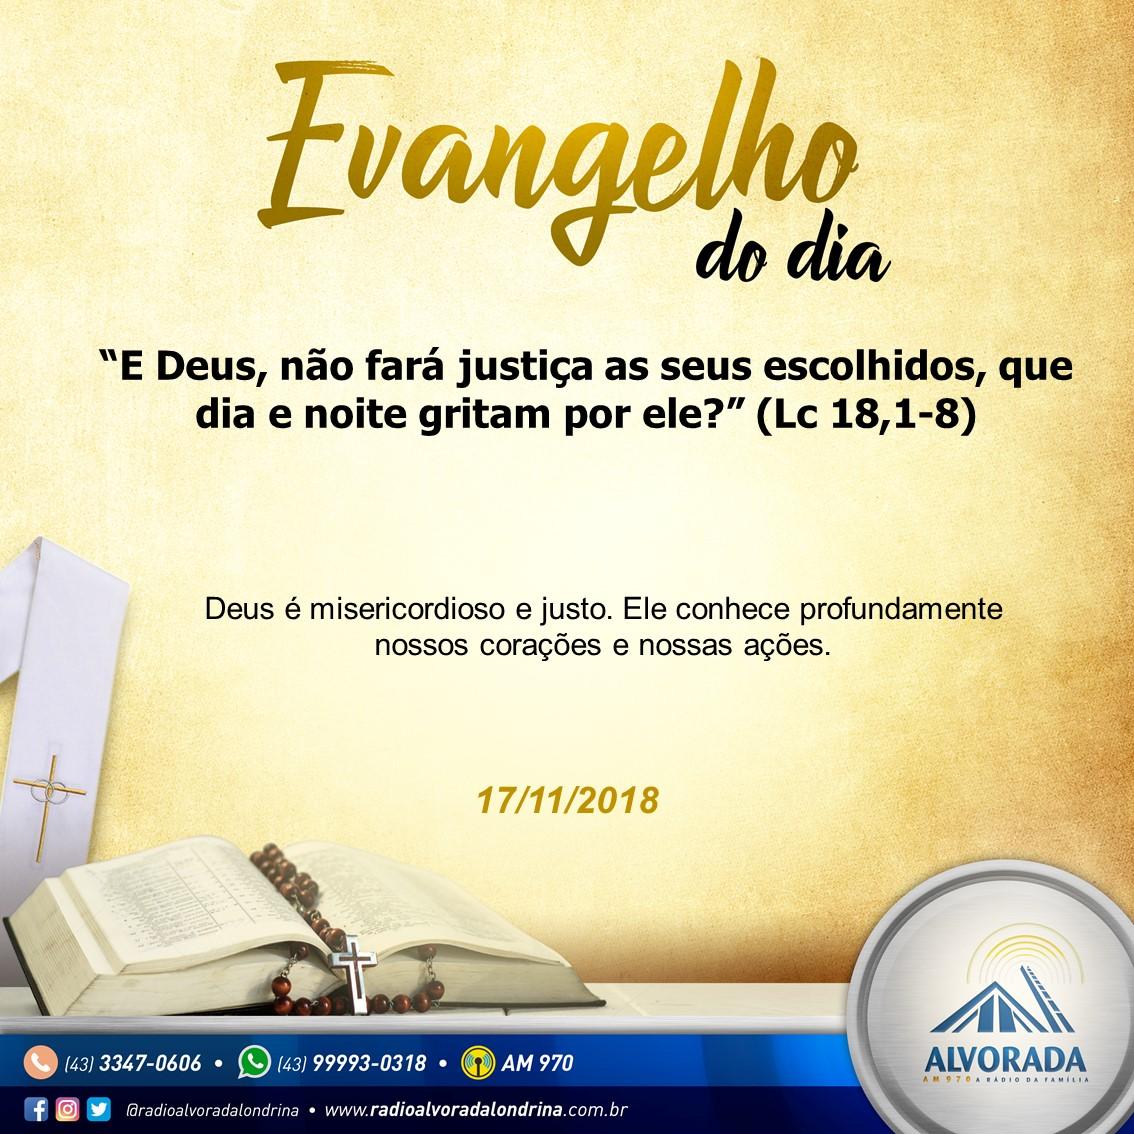 radio_alvorada_post_evangelho_do_dia_BRANCO 171118